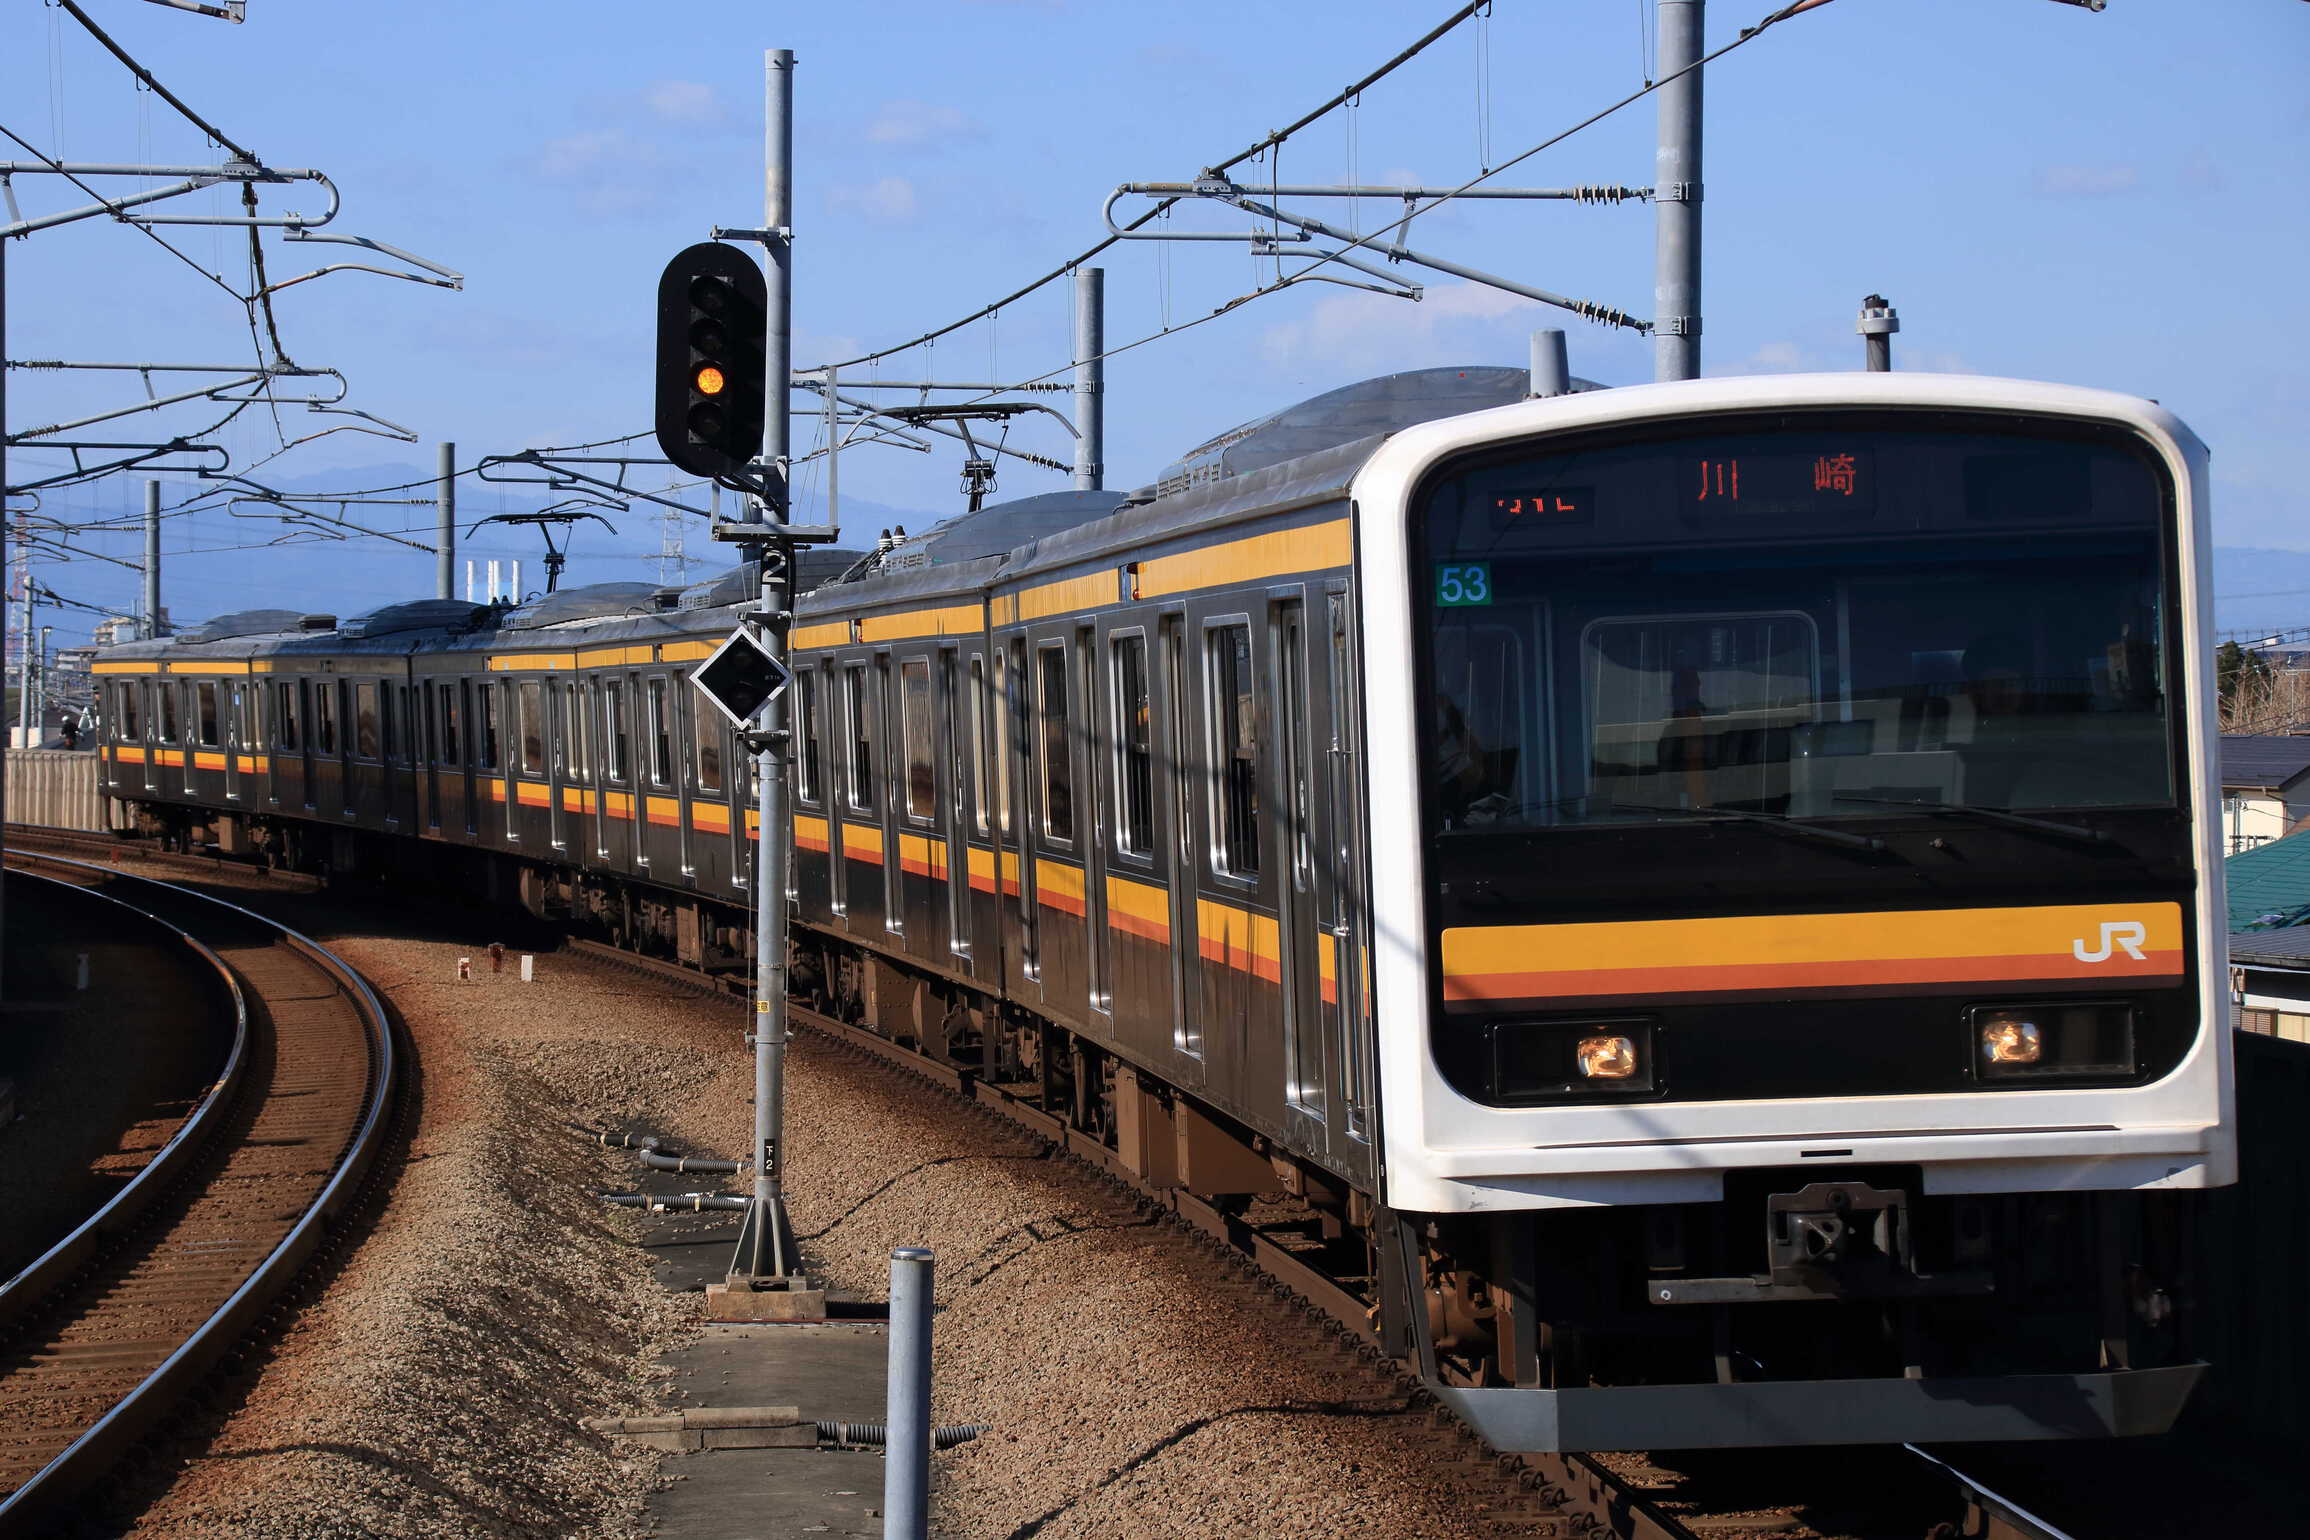 1130F 209系 横ナハH53編成